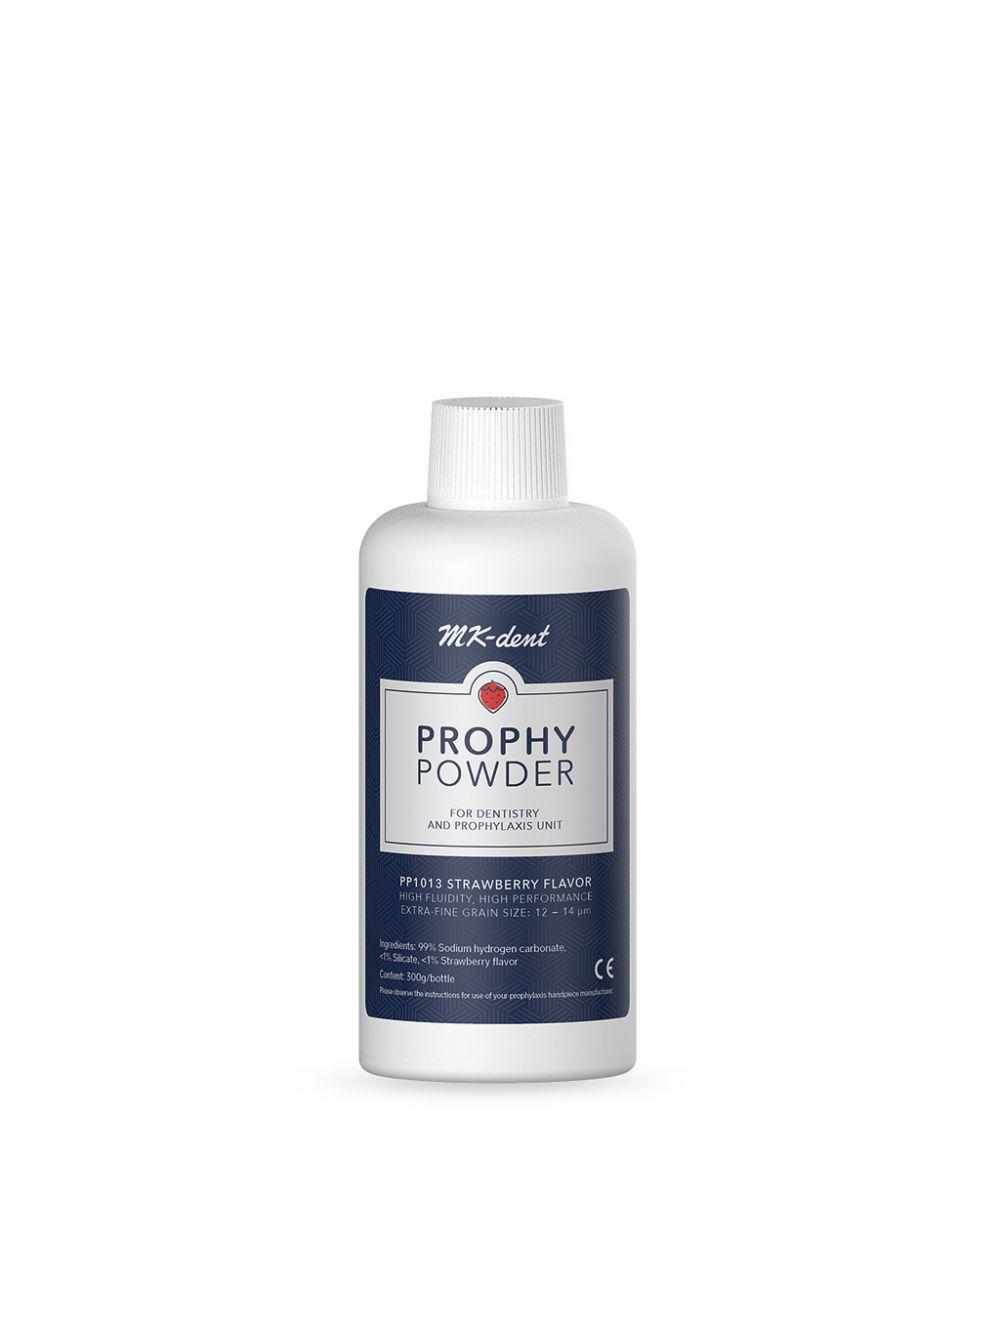 MK-dent Prophy Powder Erdbeere PP1013/4